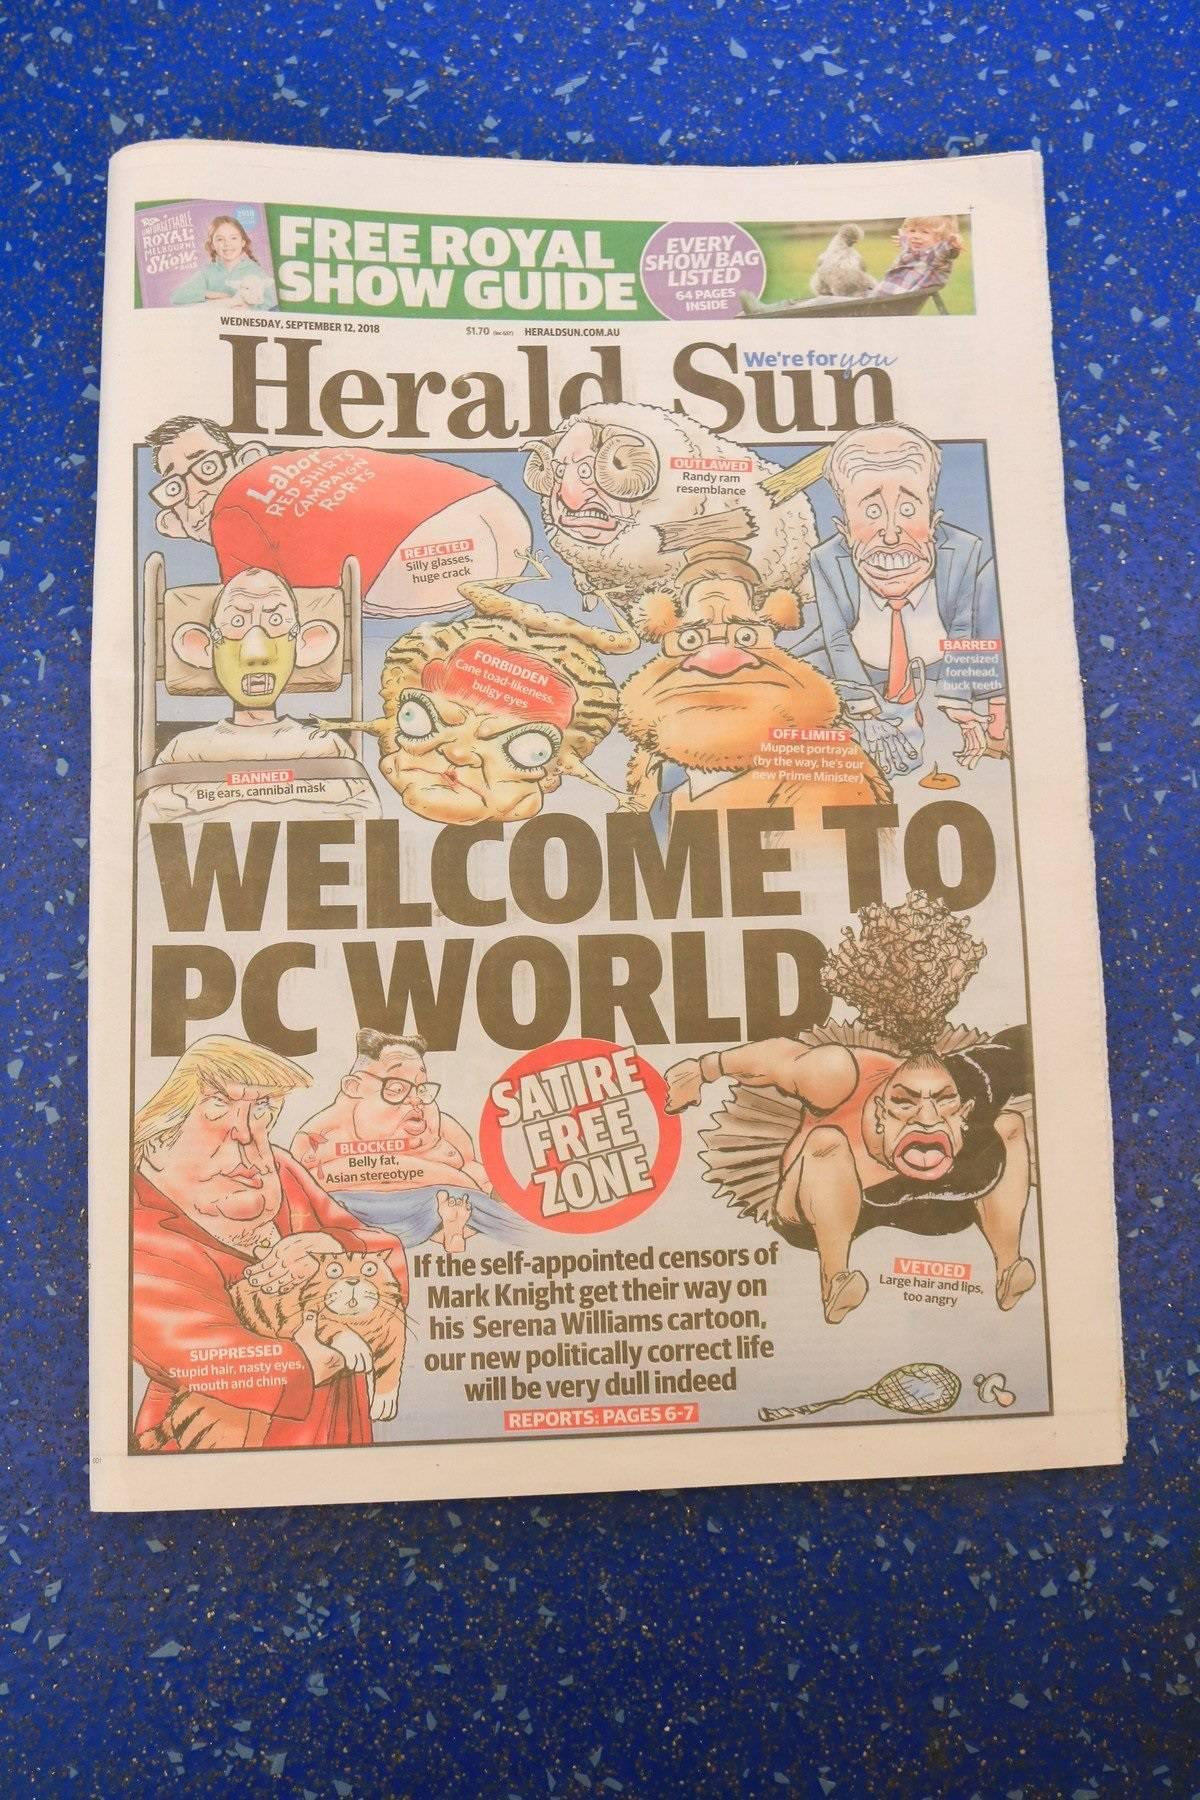 Herald Sun Responds to Serena Williams Cartoon, Adelaide, Australia - 12 Sep 2018